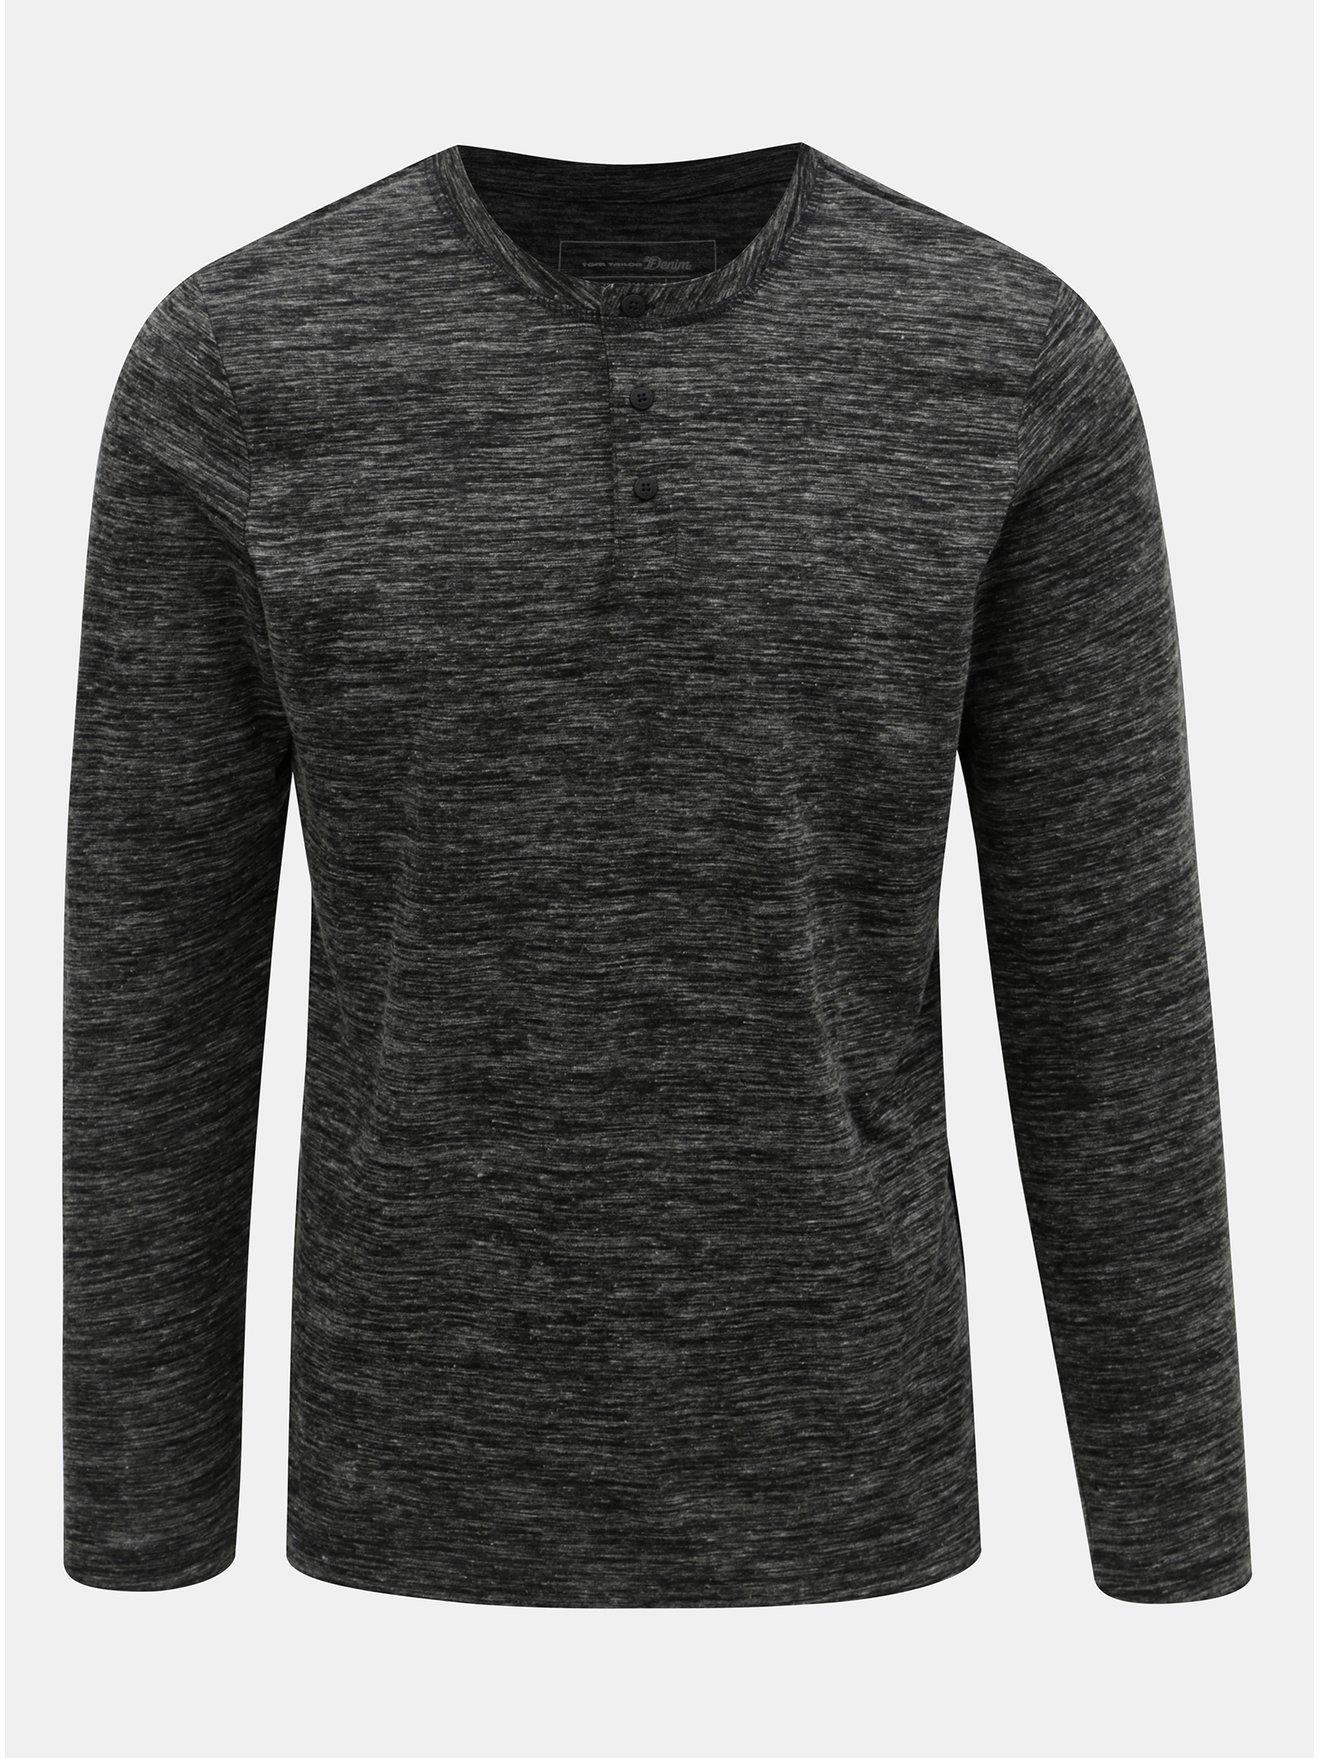 Tmavě šedé pánské žíhané tričko na knoflíky Tom Tailor Denim